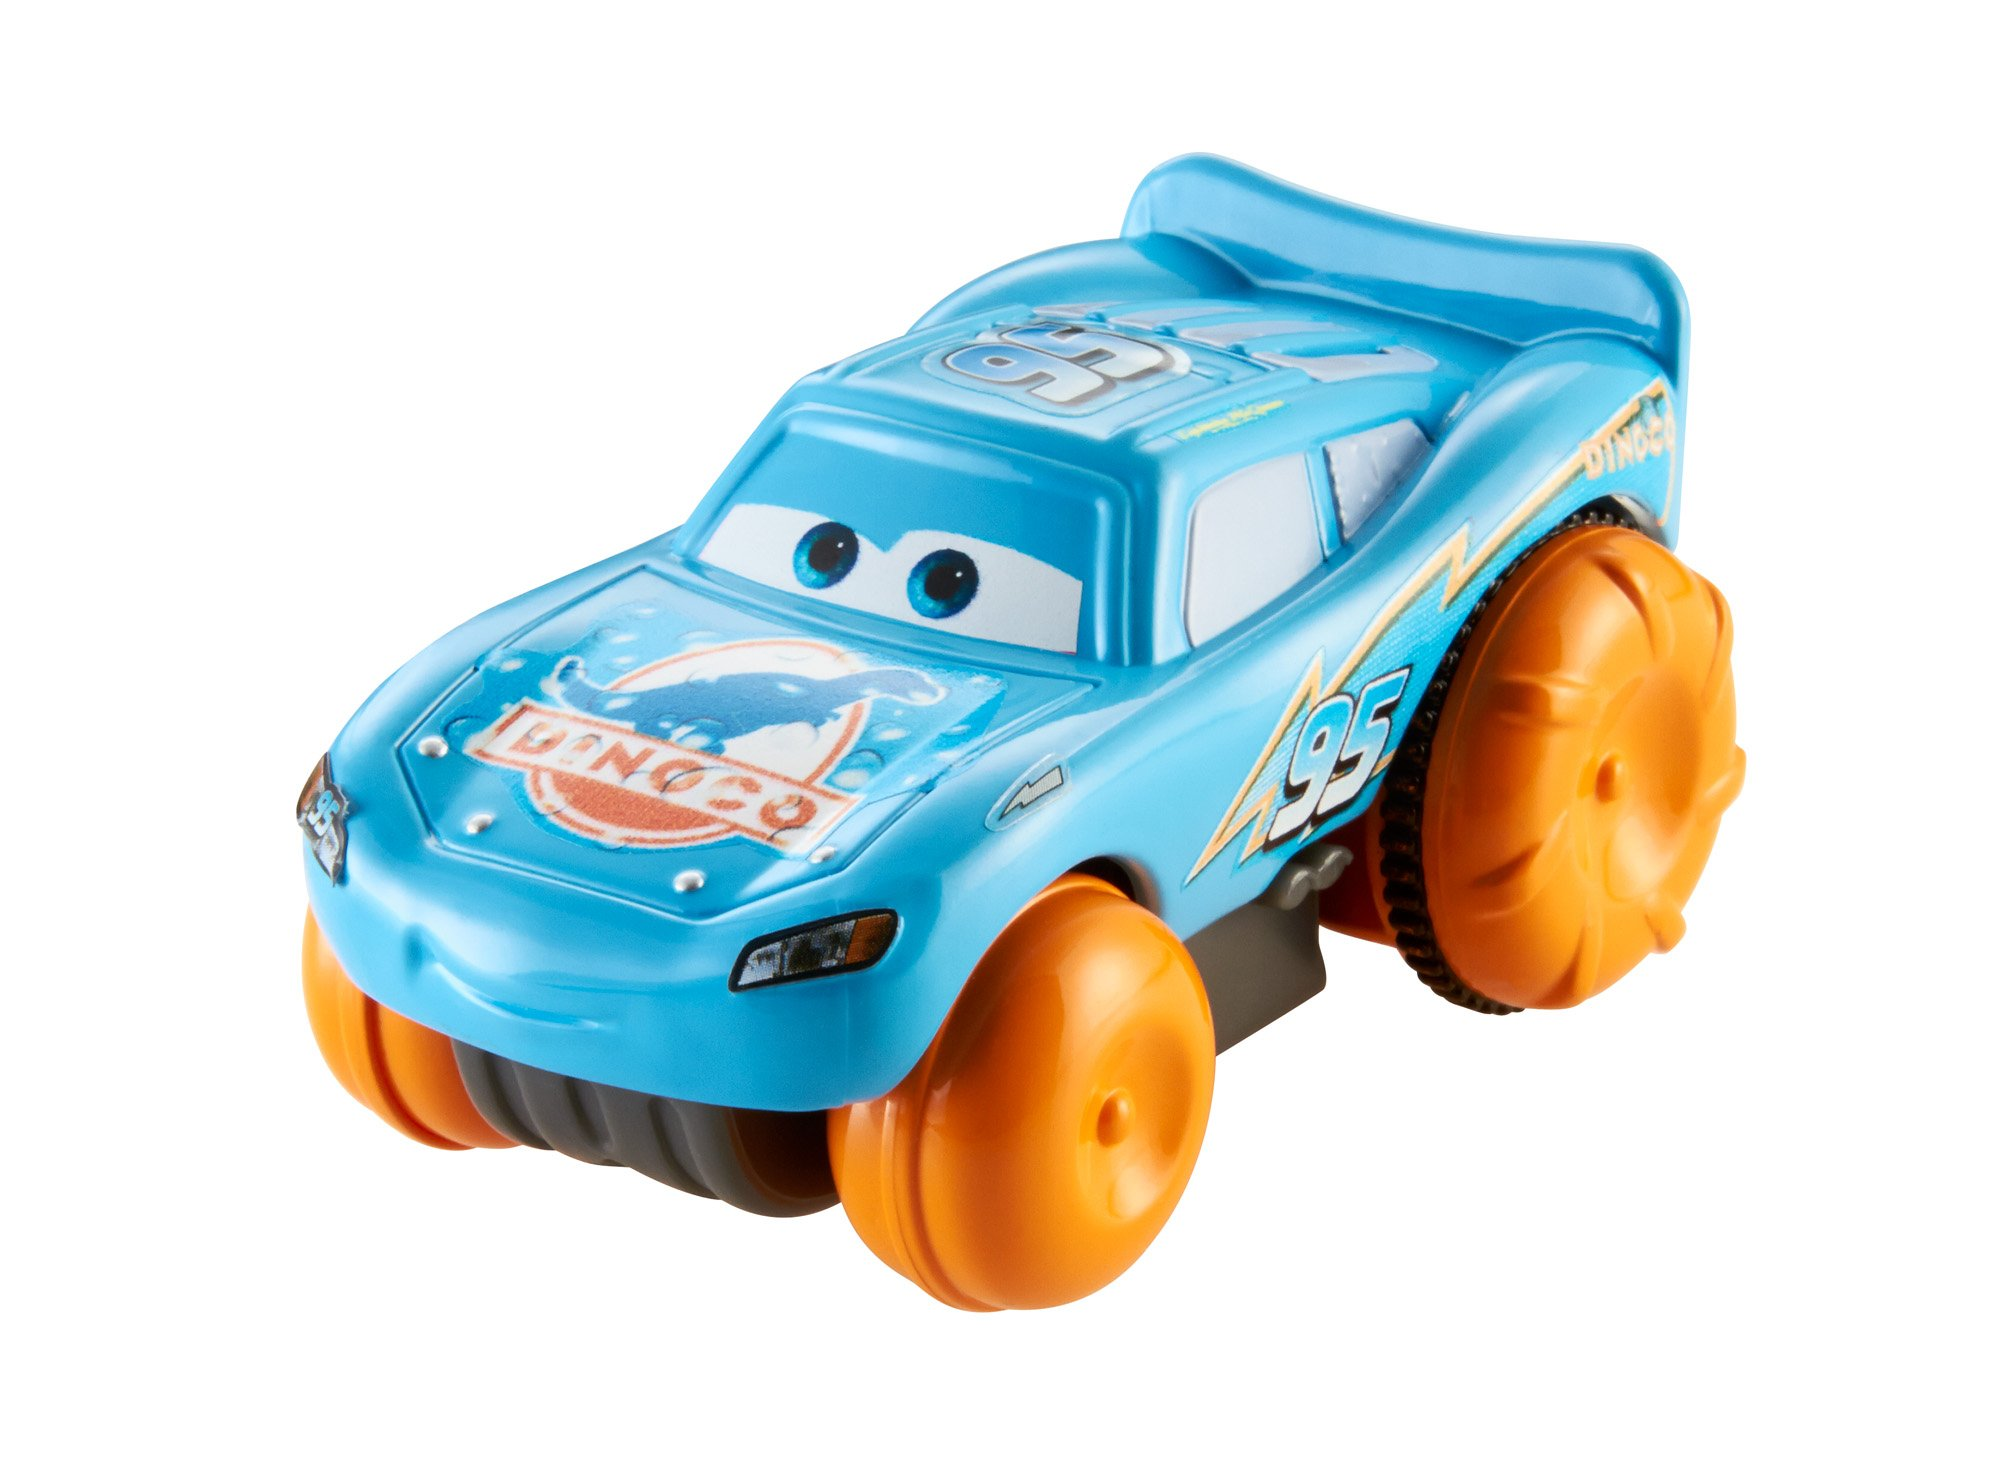 CRUZ RAMIREZ hydro wheels splash racers disney pixar cars 2 3 NEW bath pool toy